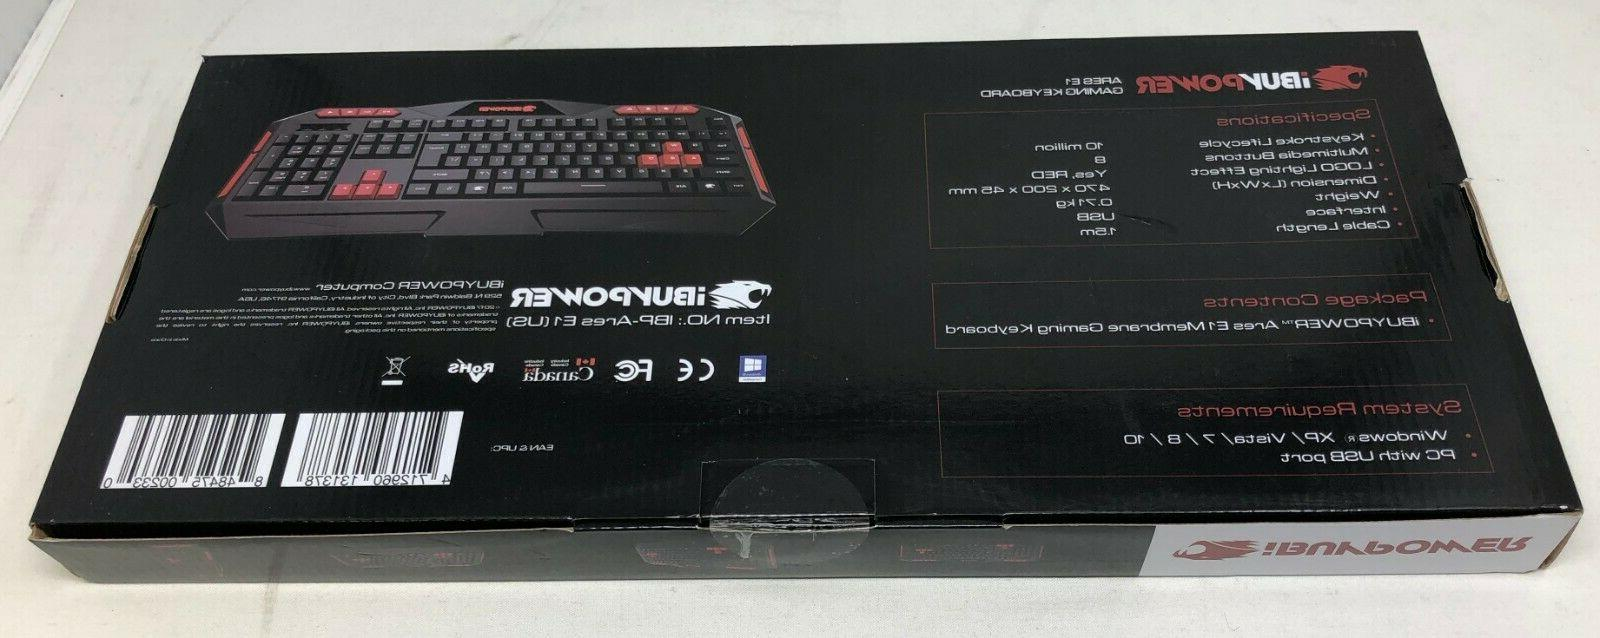 New! Gaming Resistant Keyboard Black Red